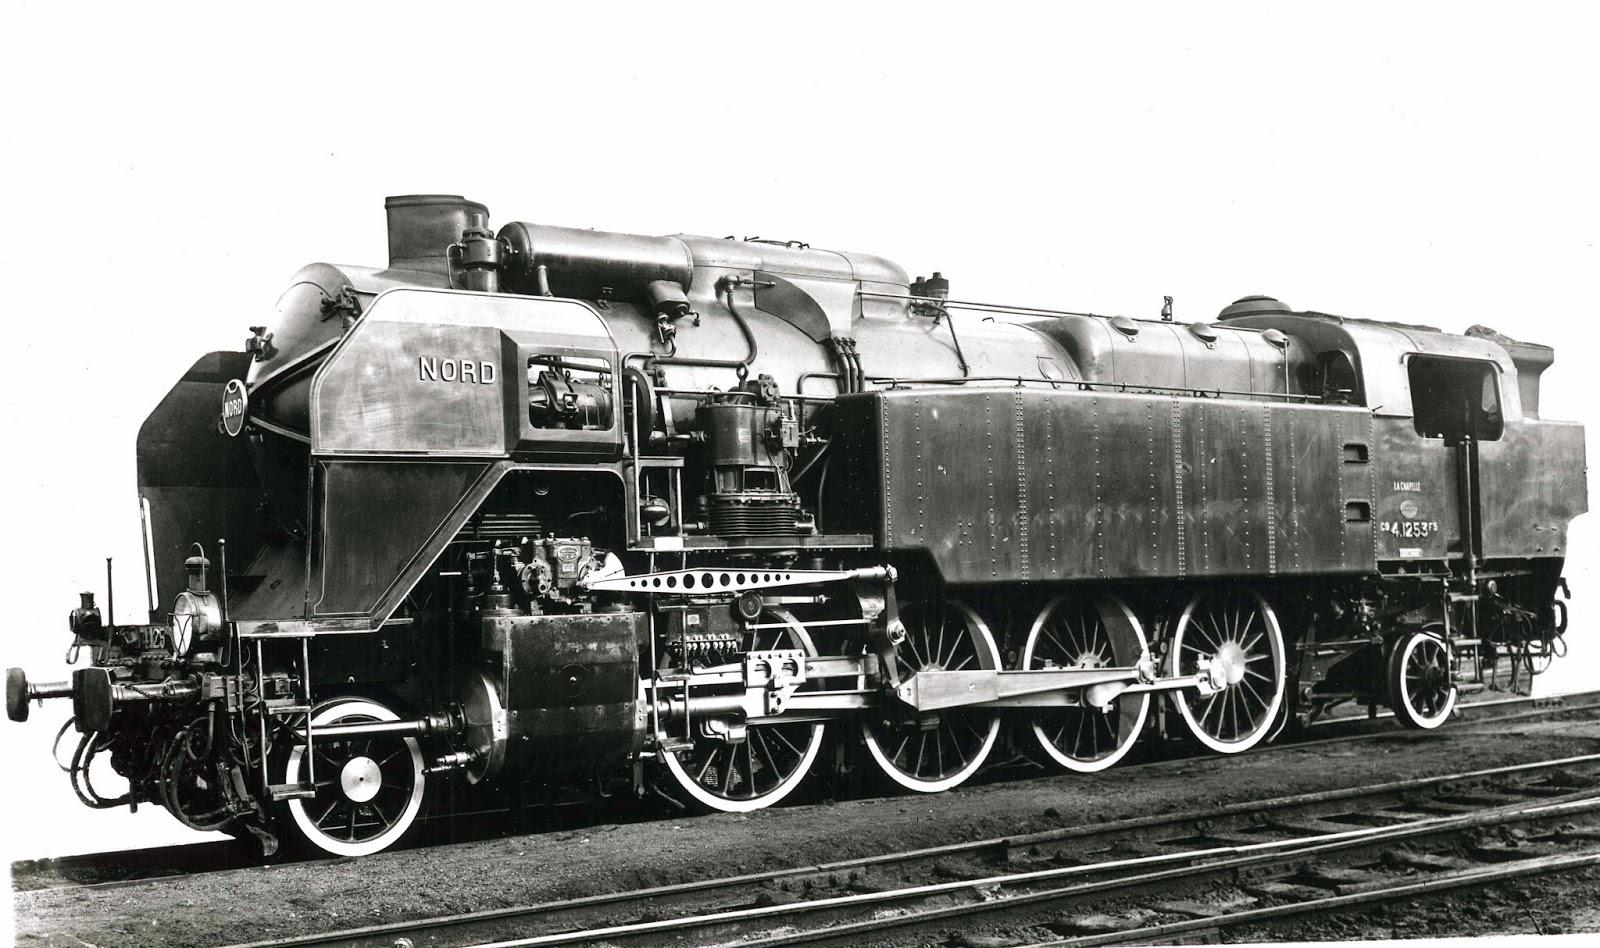 141 TC Nord